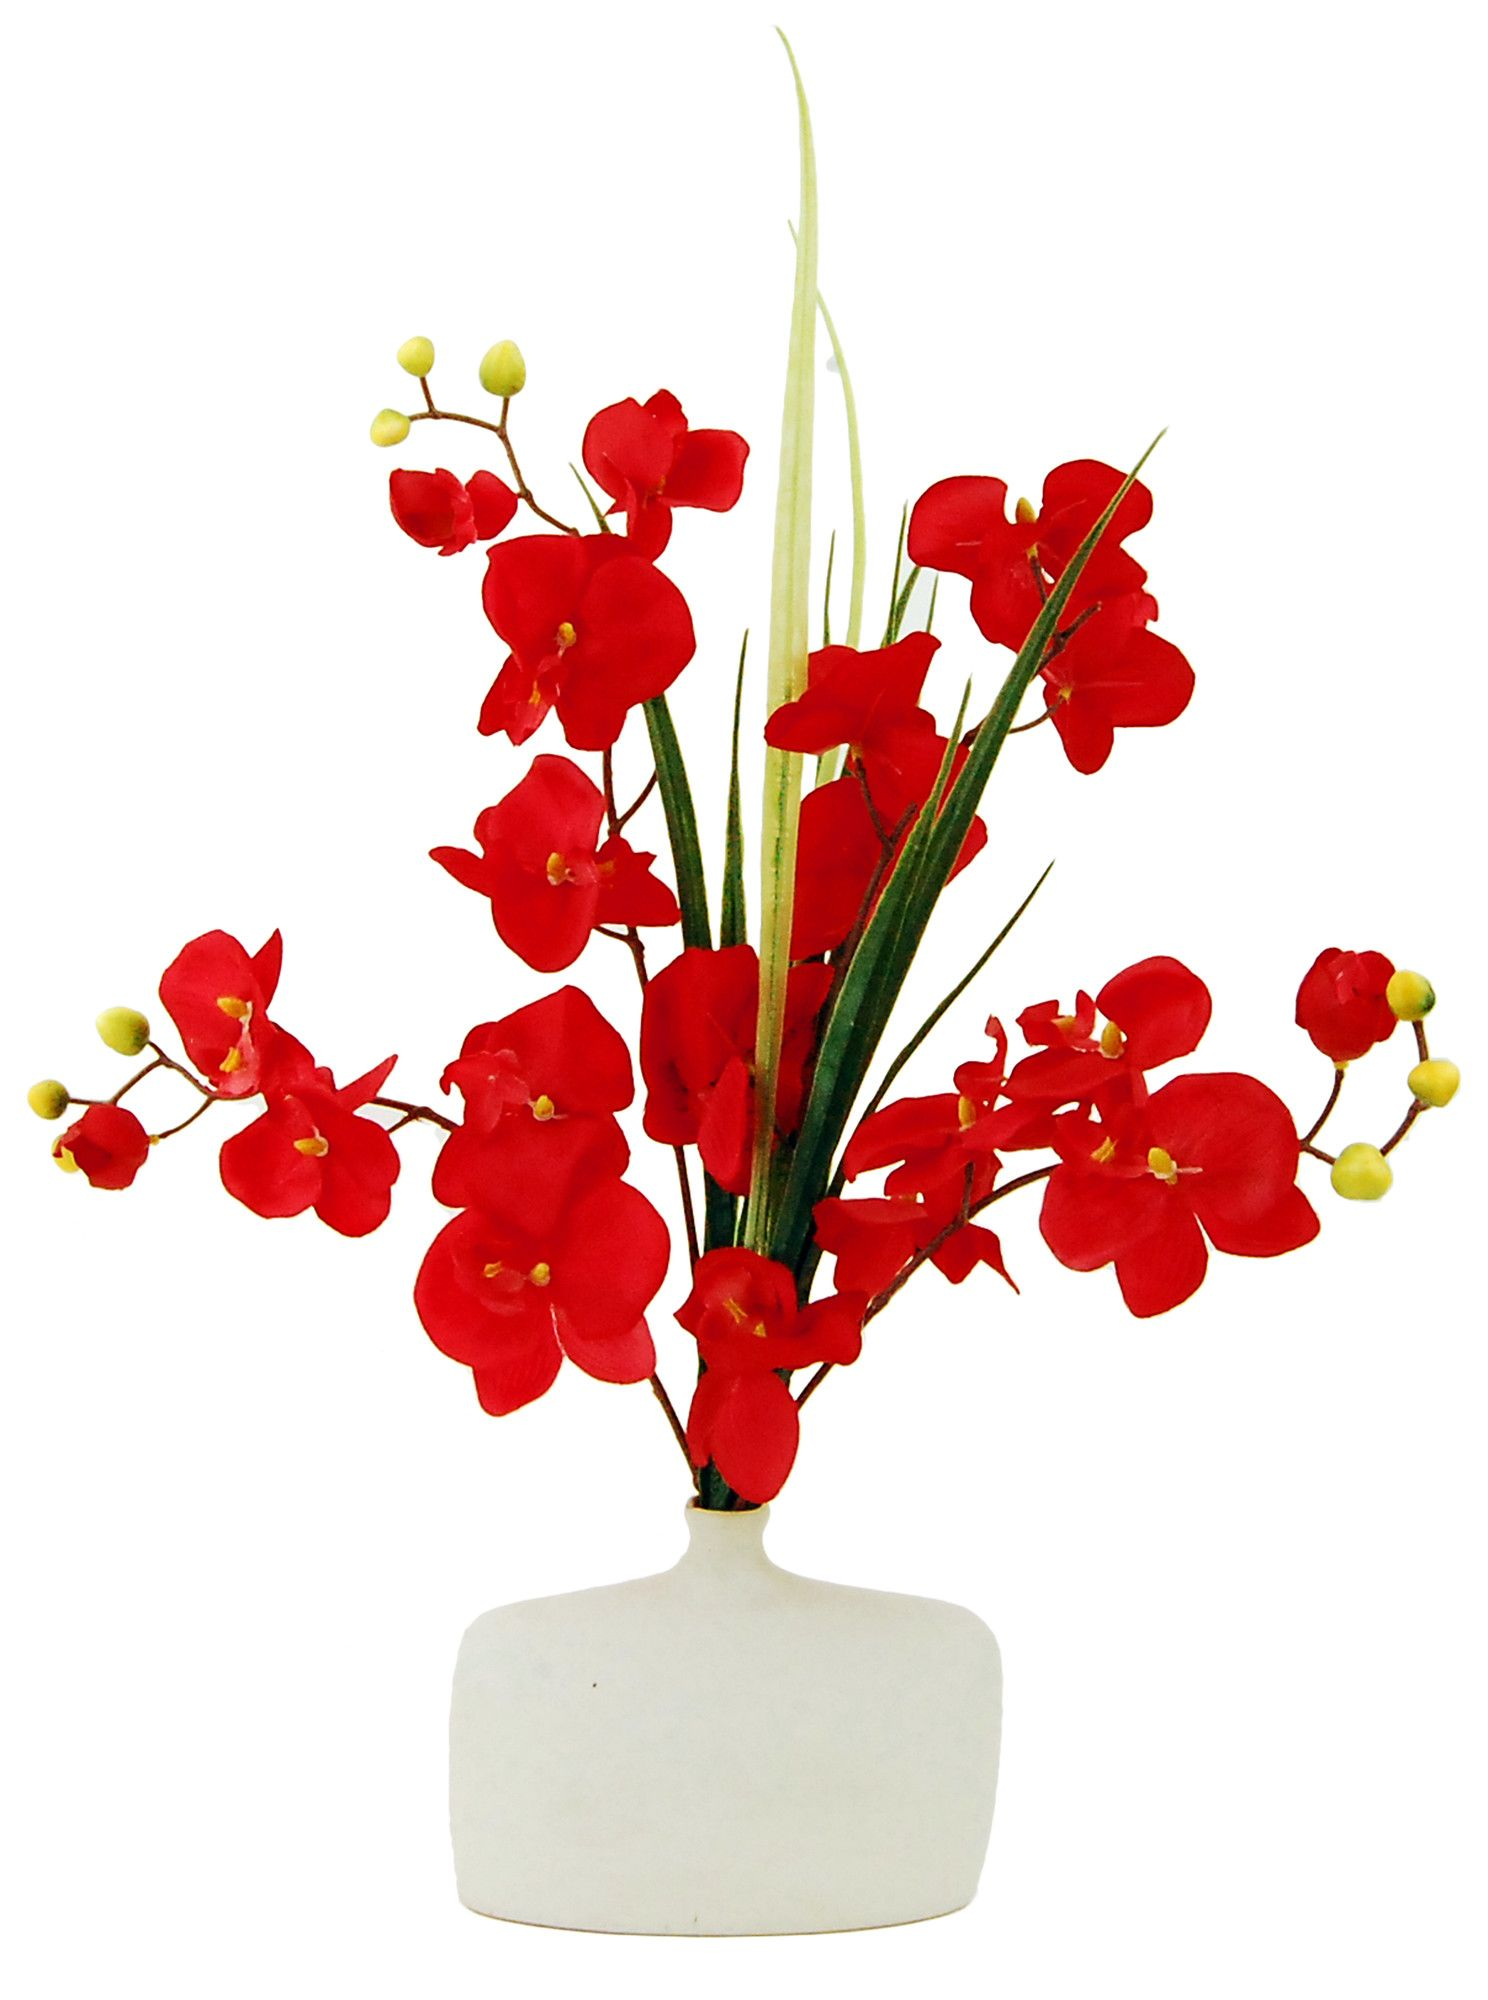 Phalaenopsis Orchids in Ceramic Pot